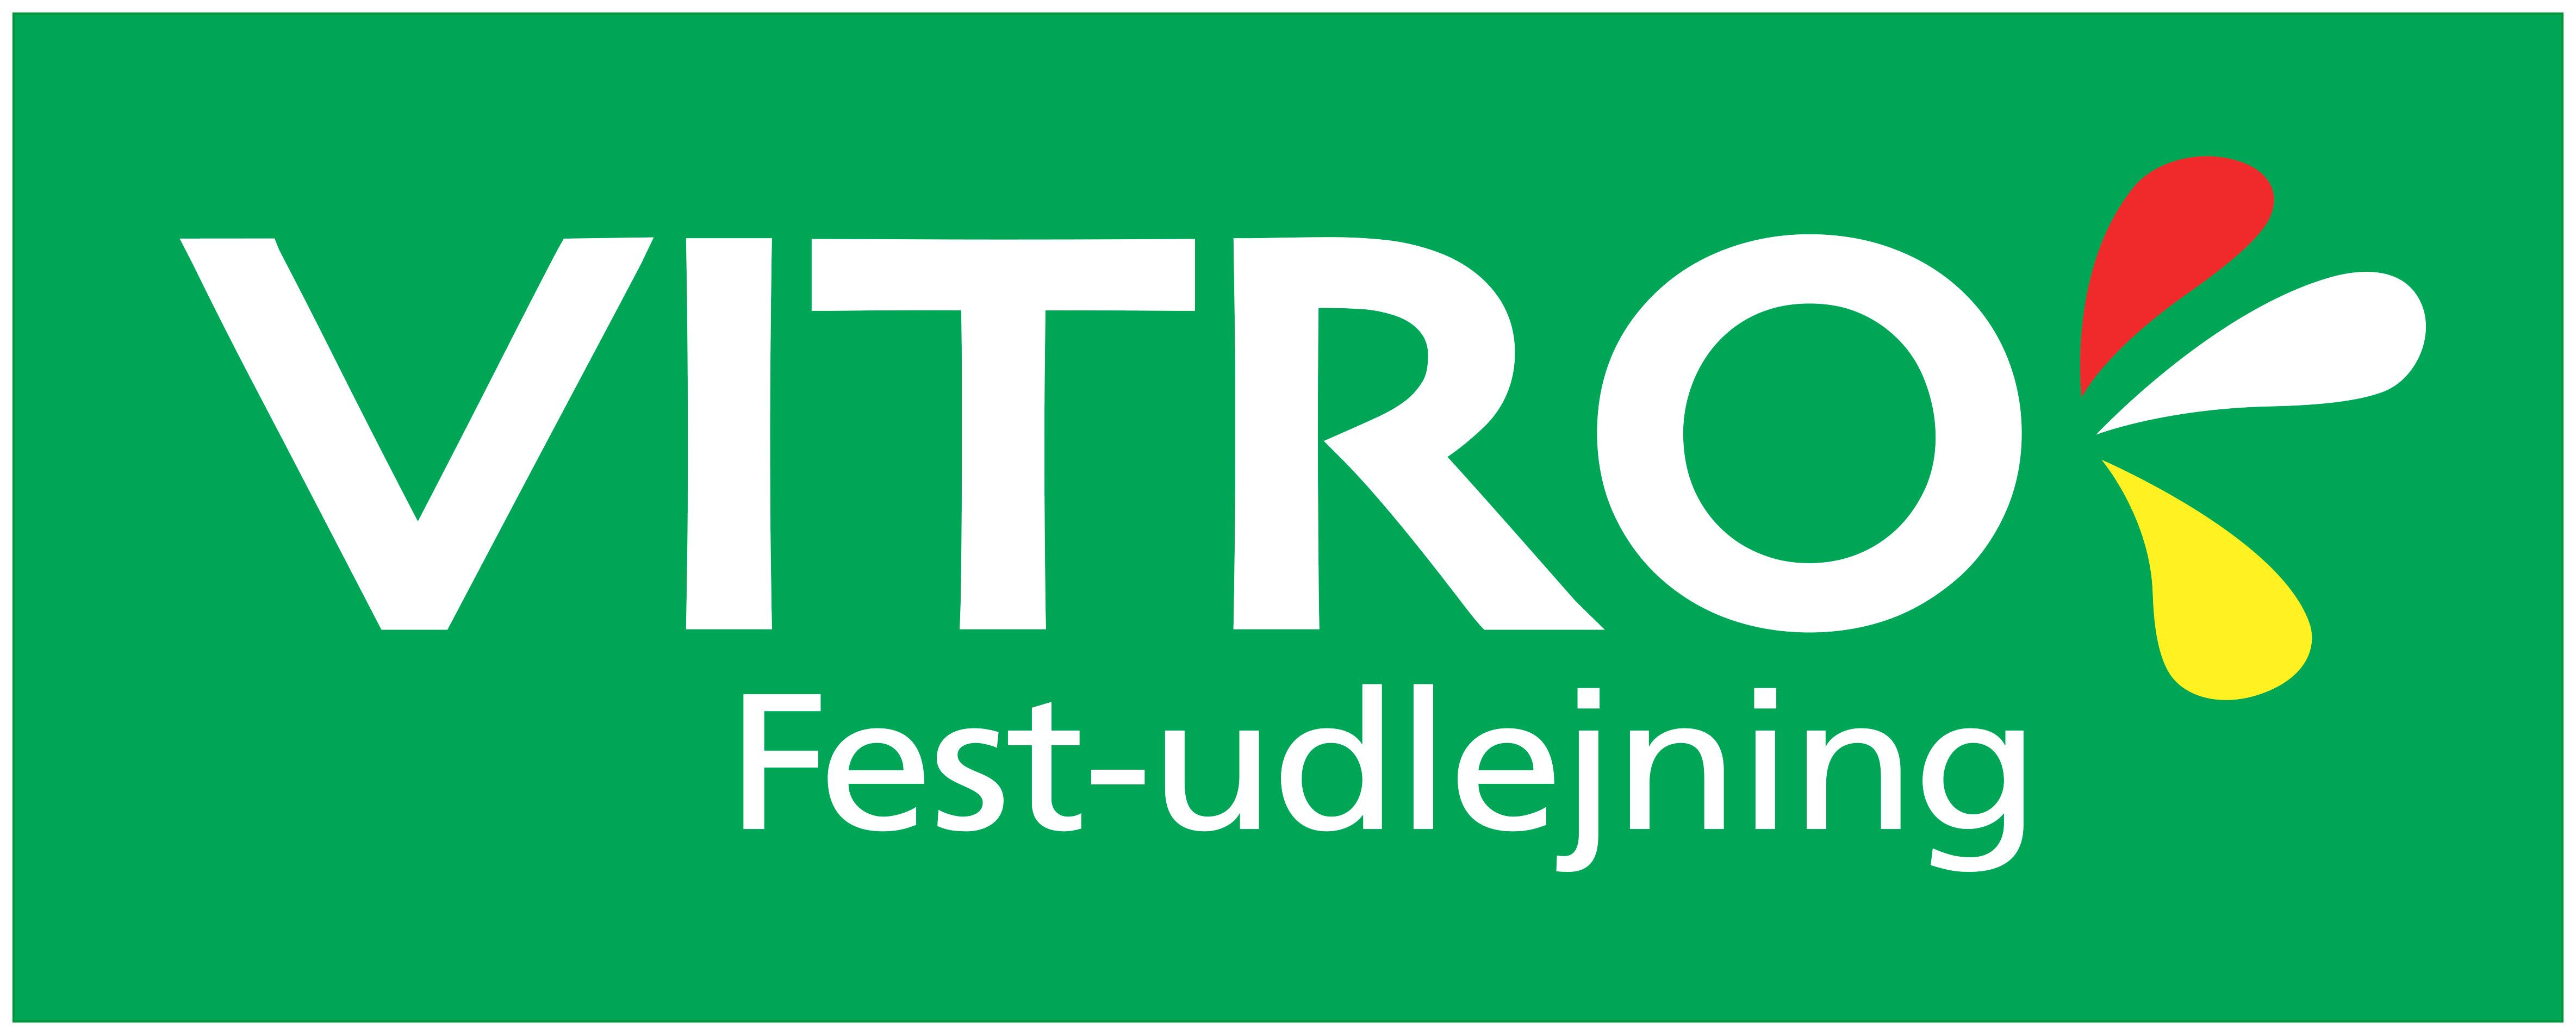 VITRO-cmyk-grøn-rød-hvid-gul